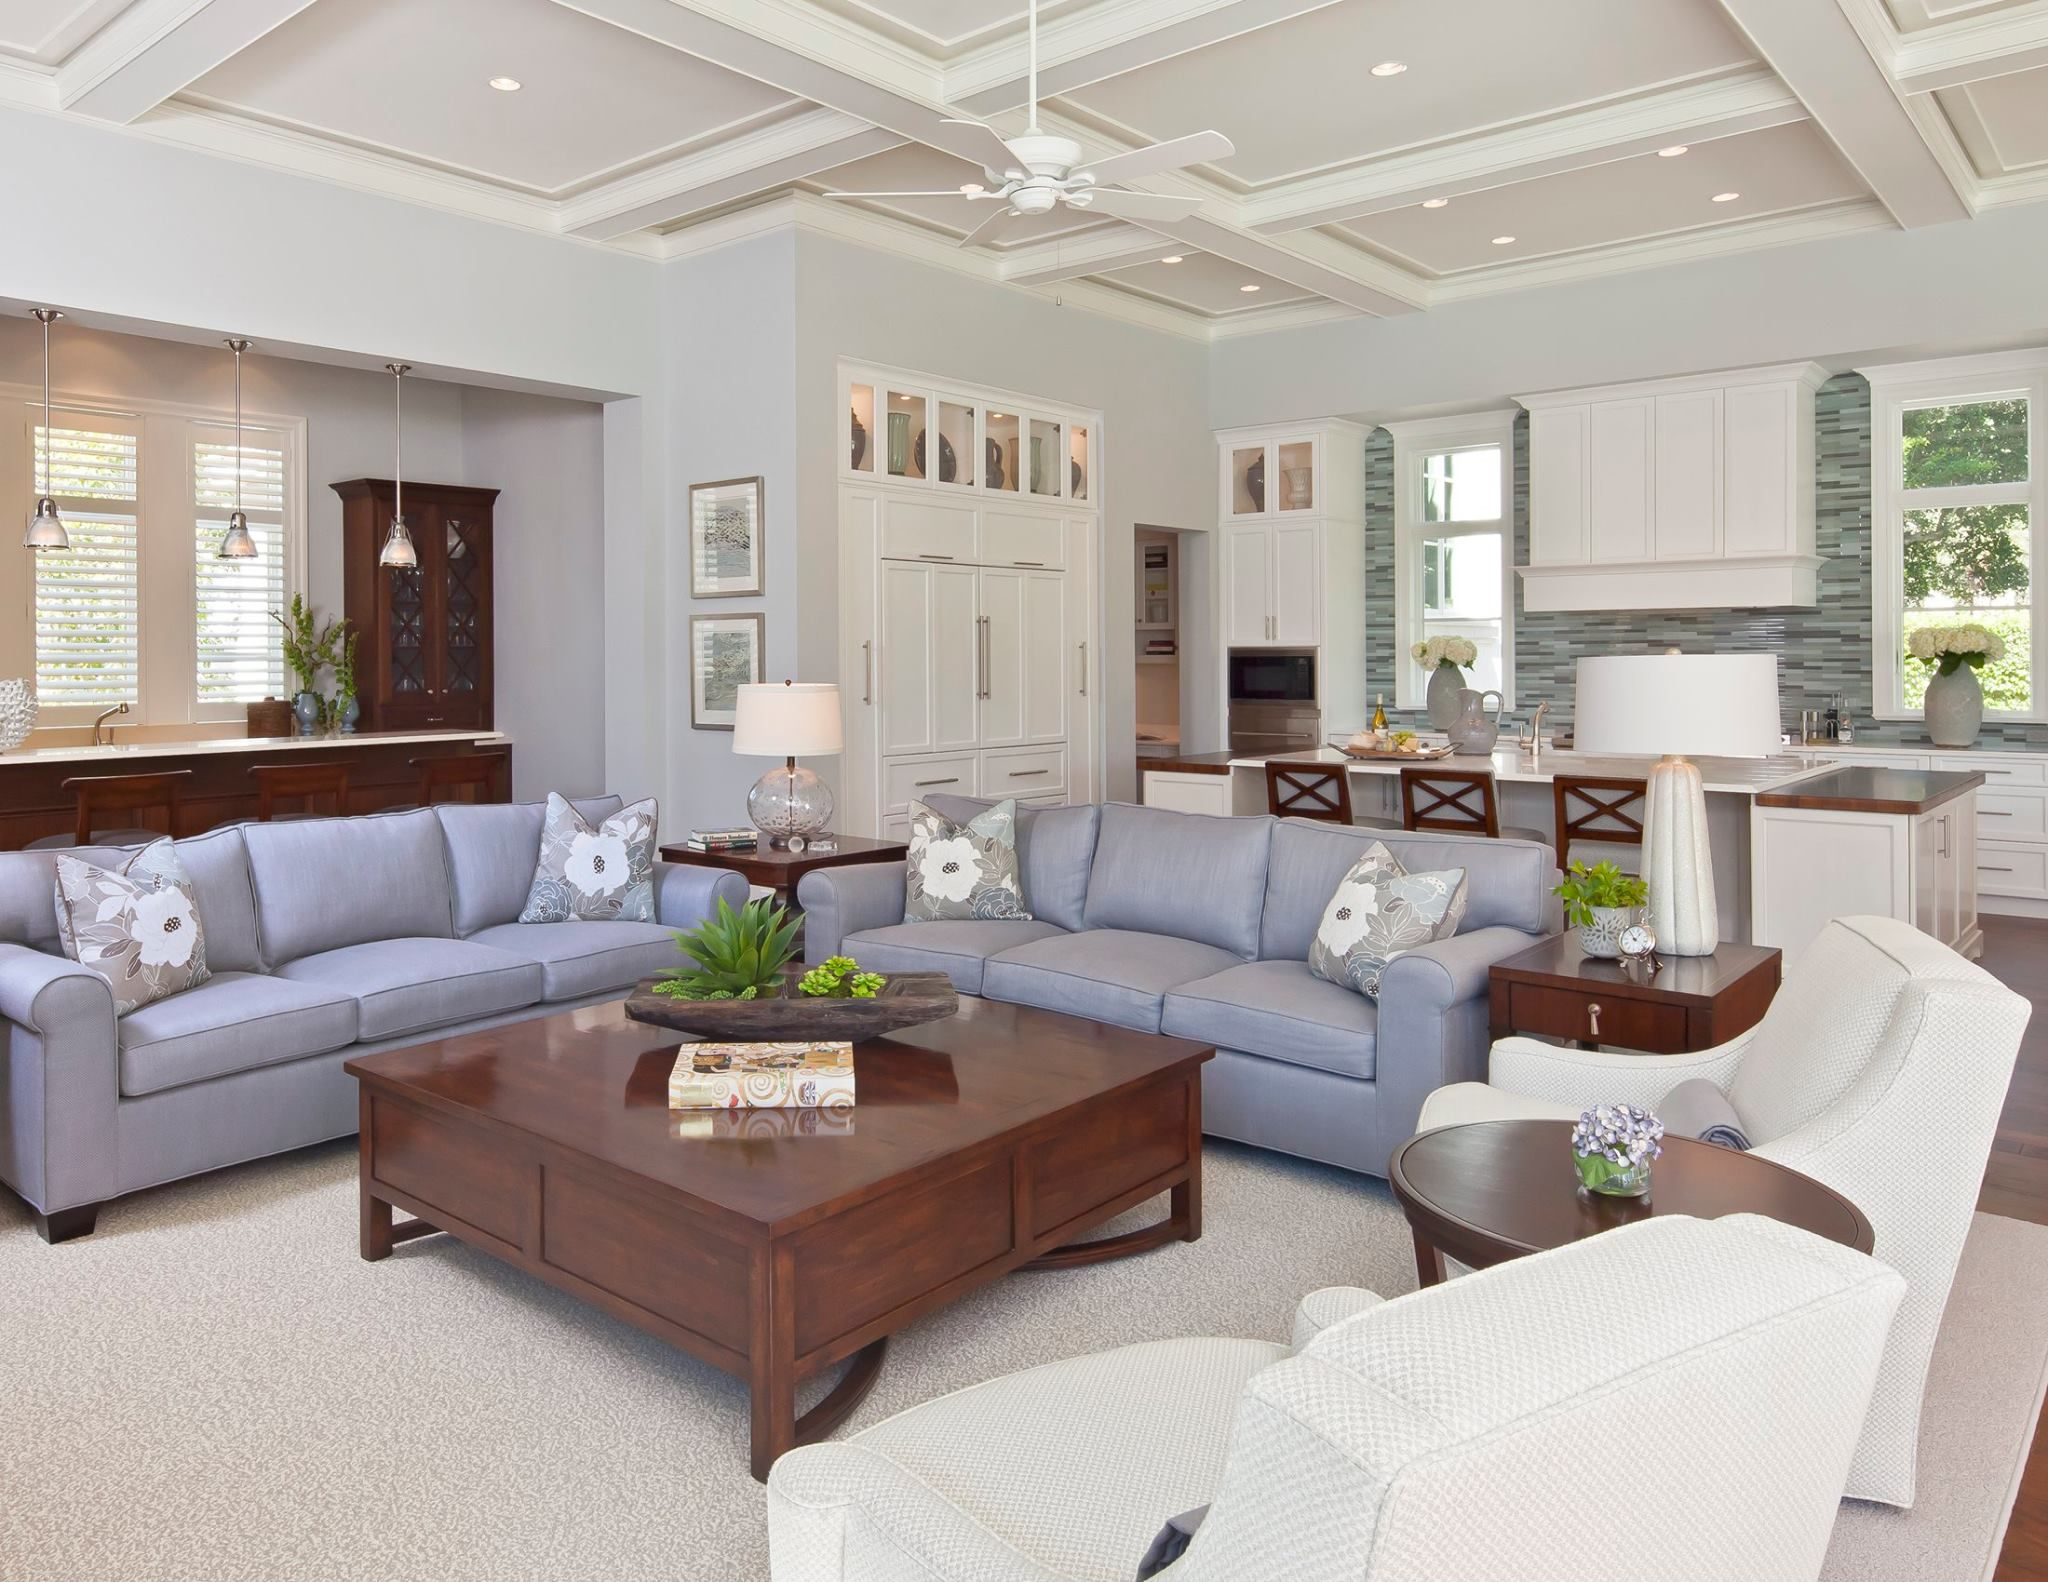 Collins & Dupont Design Group living room kitchen in waterfront community estate. design